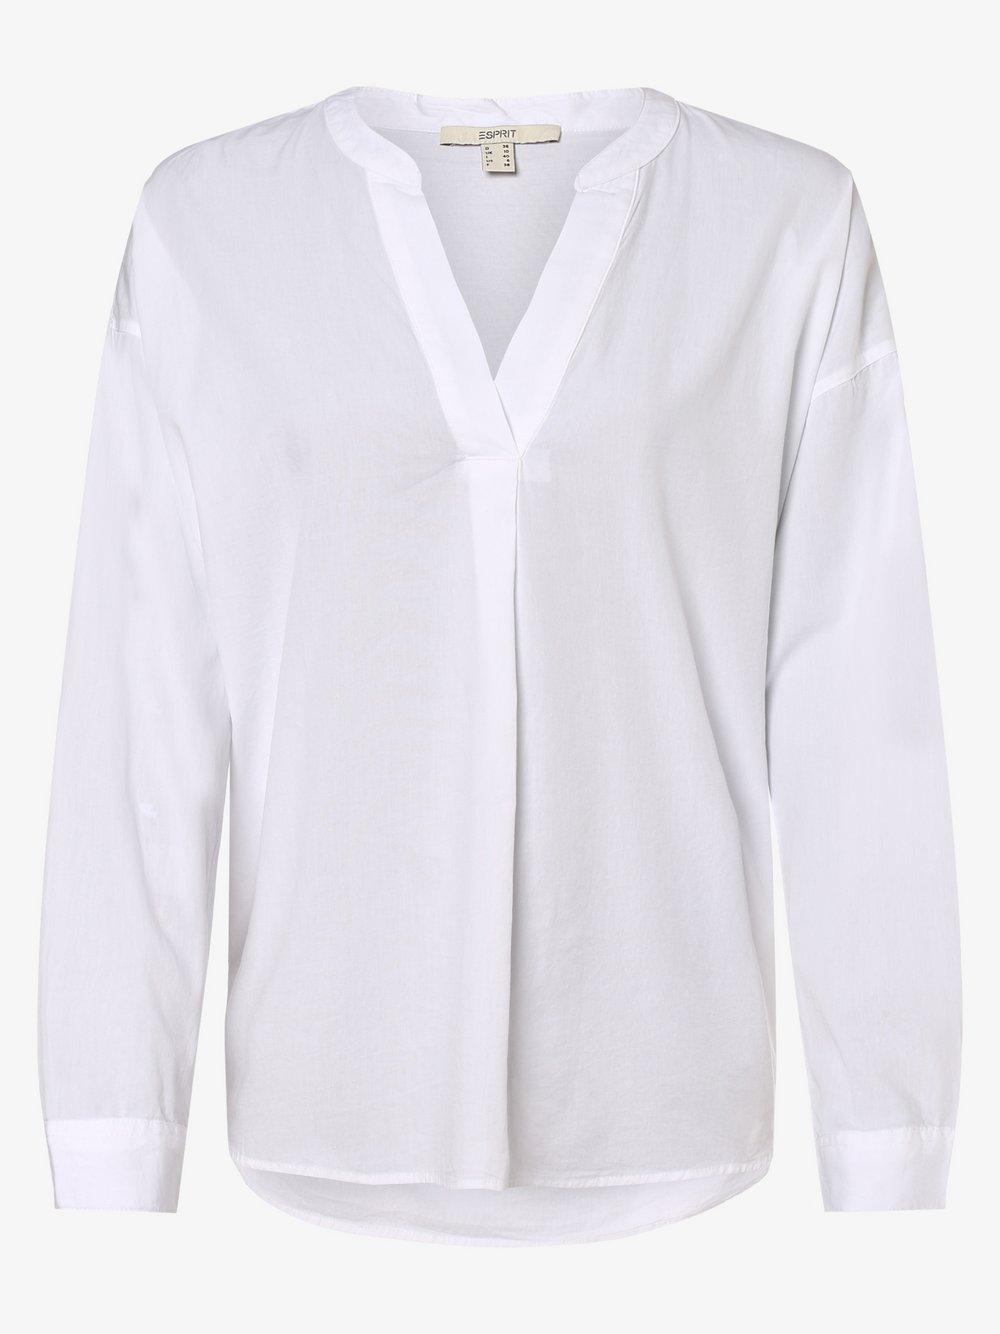 Esprit Casual – Bluzka damska, biały Van Graaf 460960-0001-00400